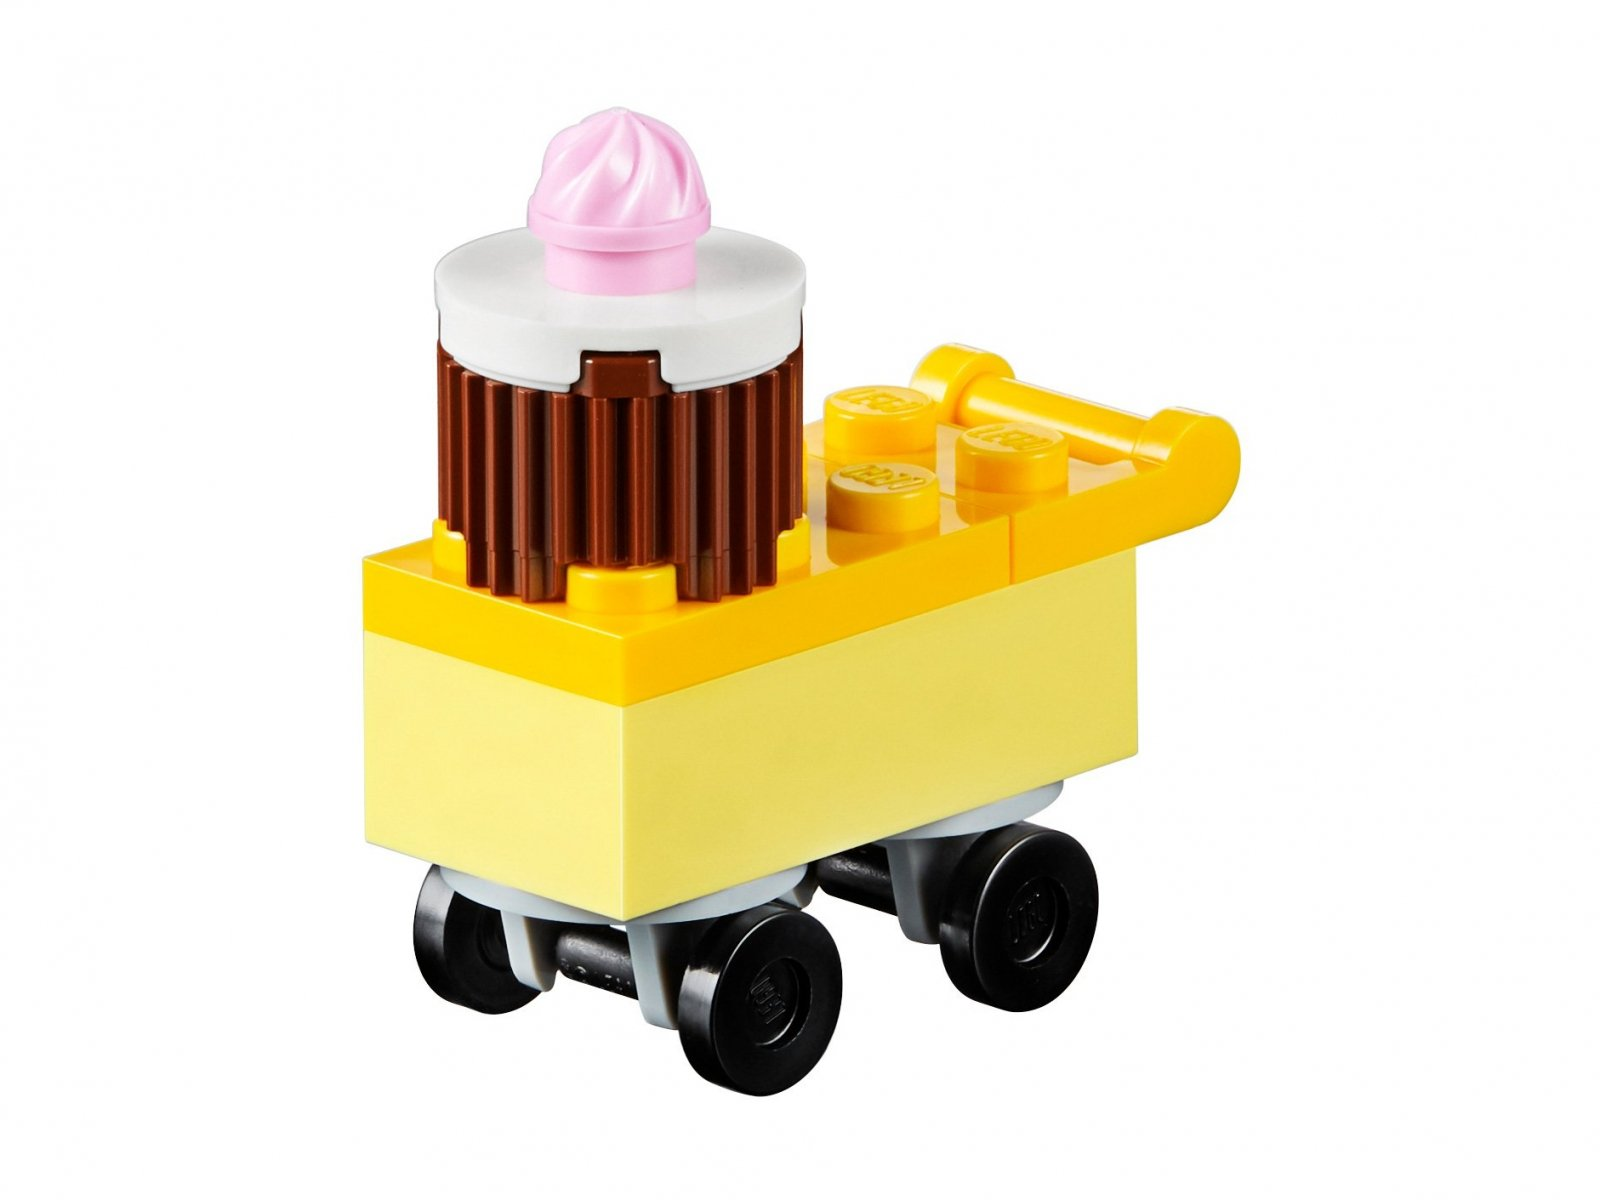 LEGO Juniors Opowieści Belli 10762